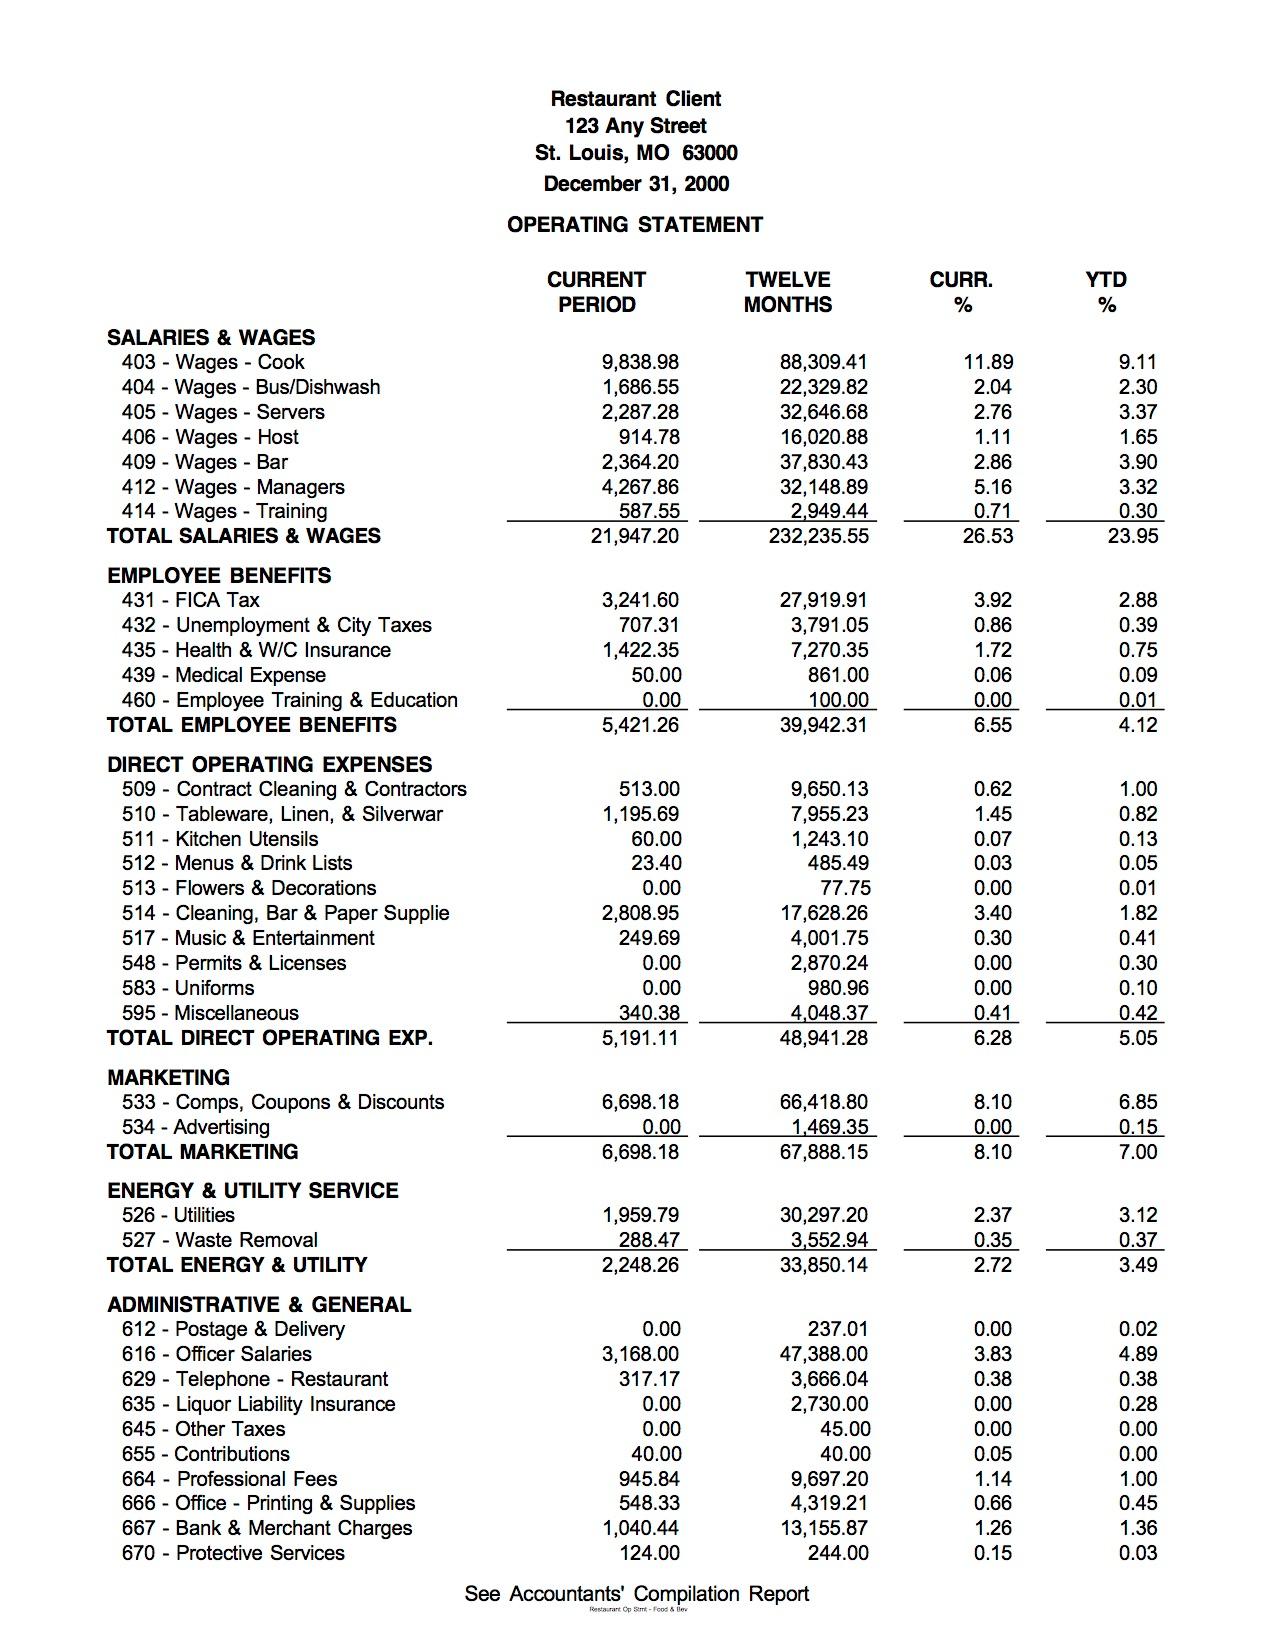 Analyze The Provided Restaurant Financial Statemen... | Chegg.com